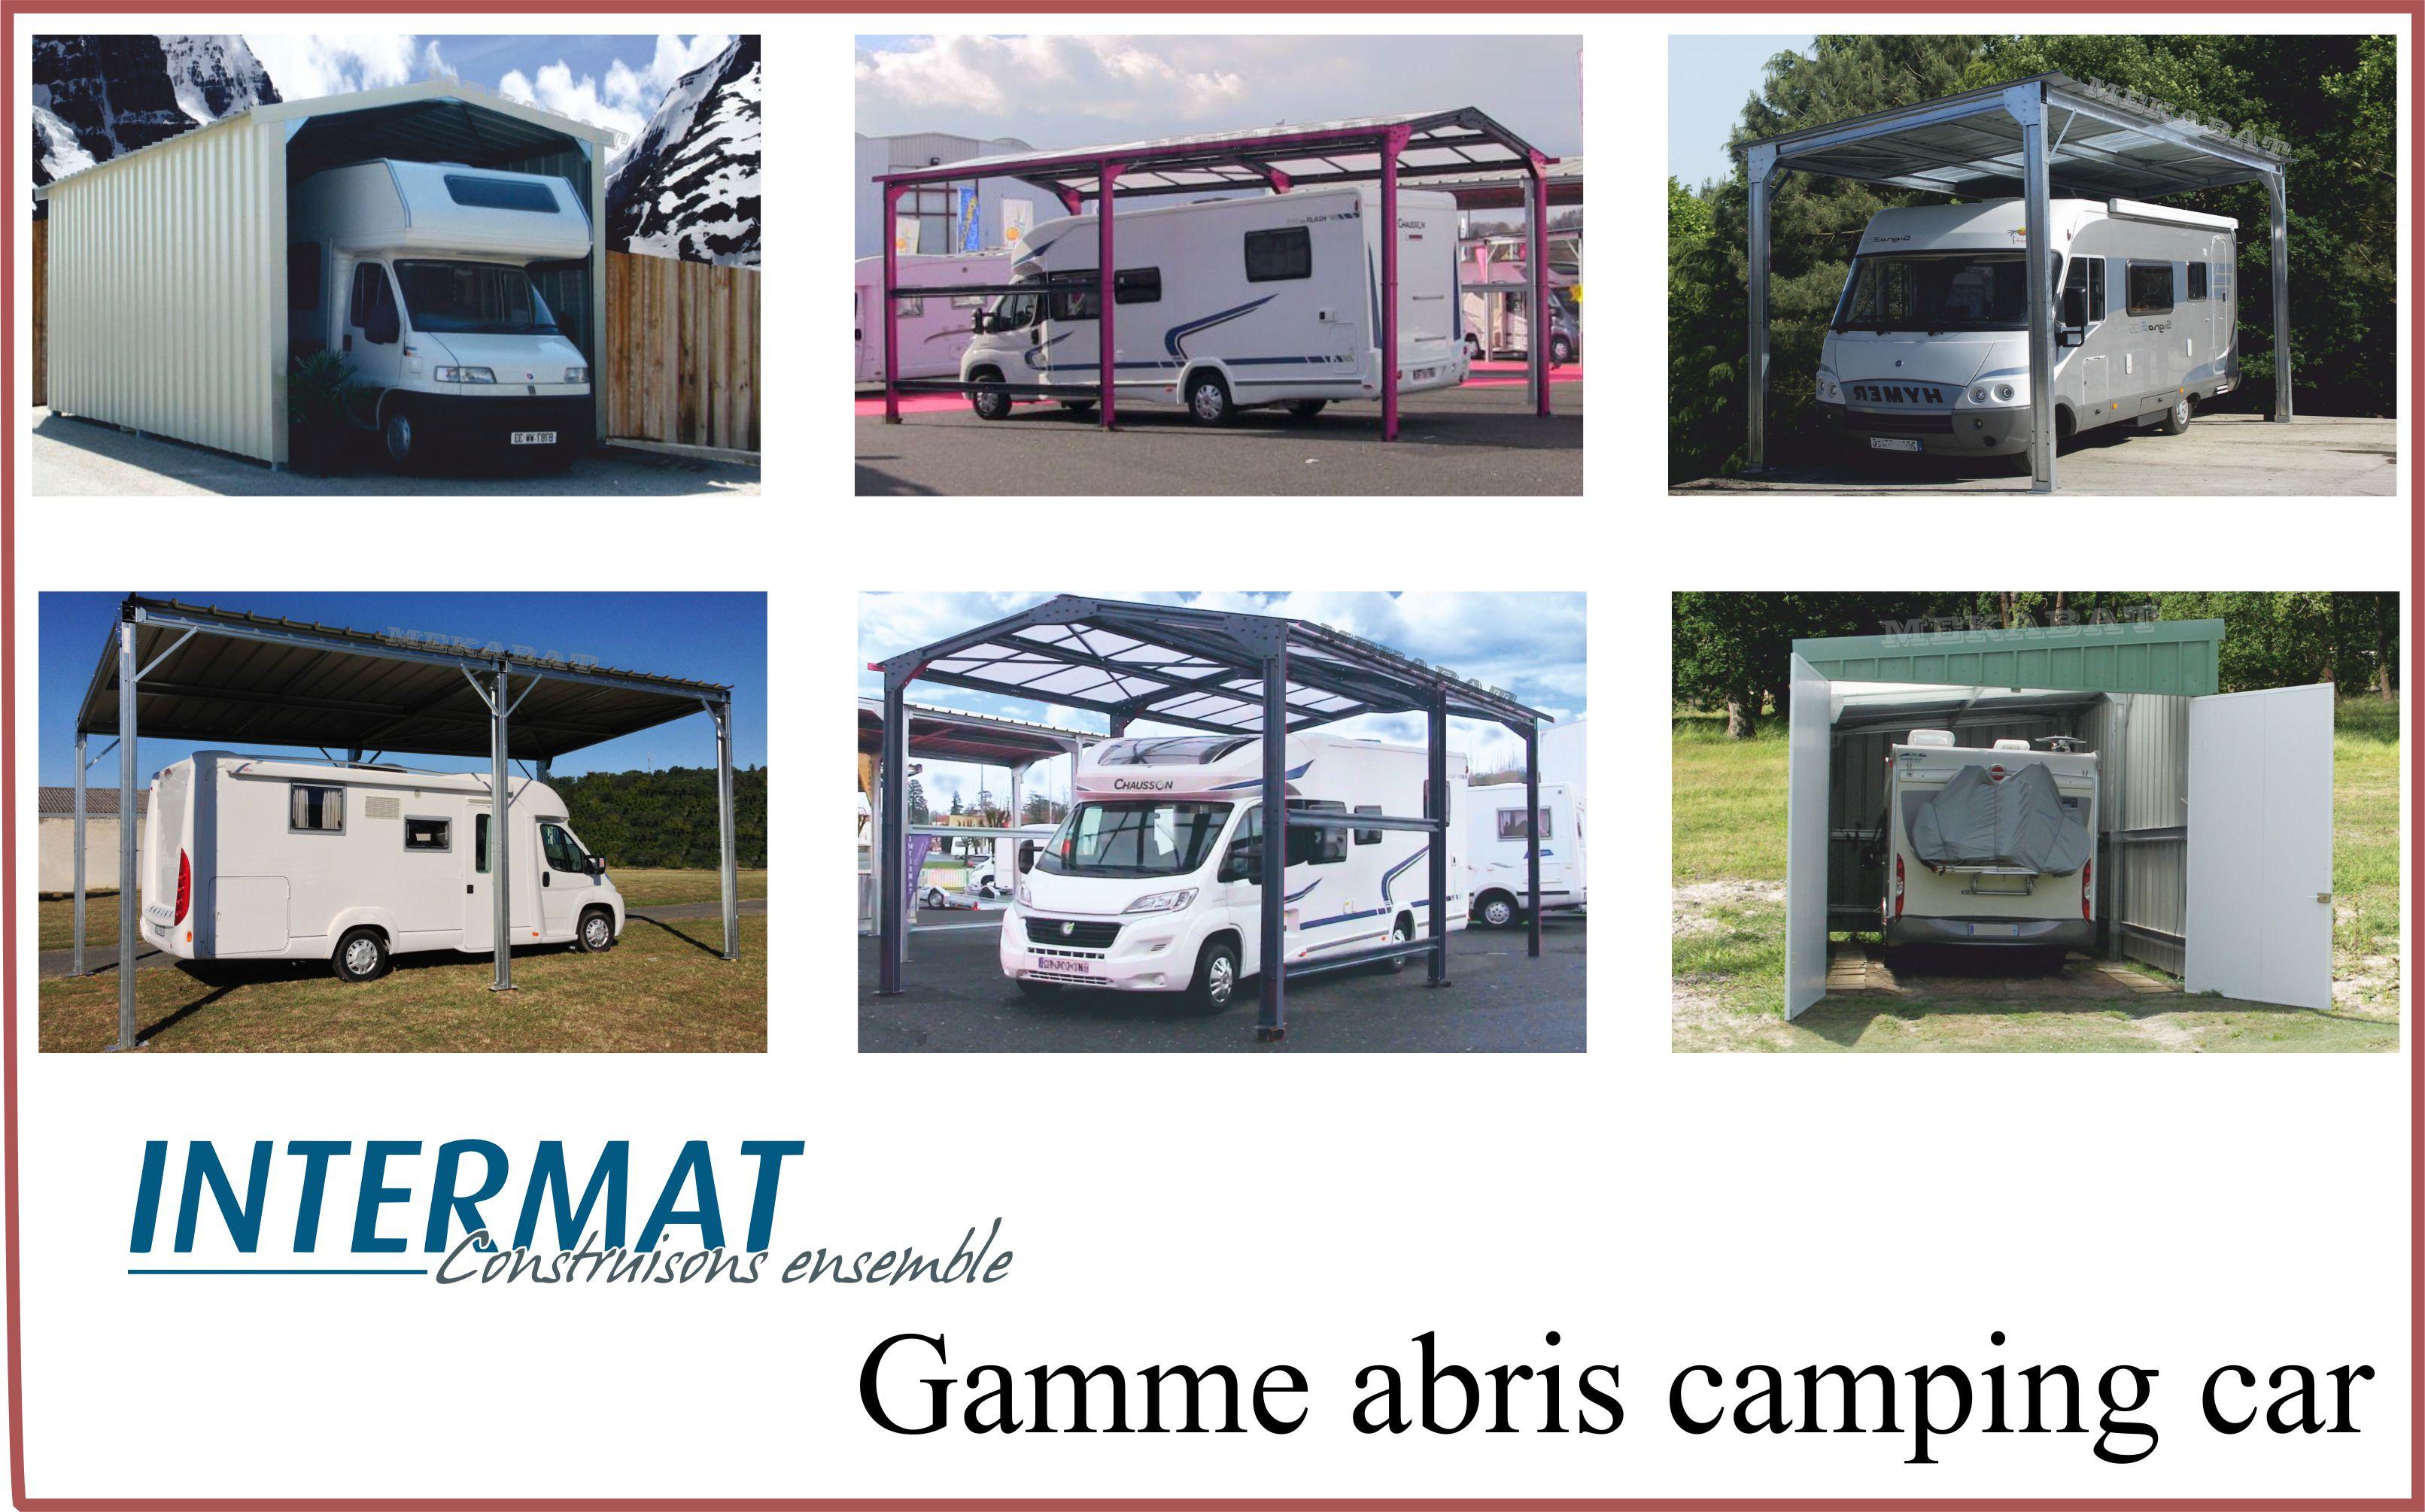 abri camping car métallique